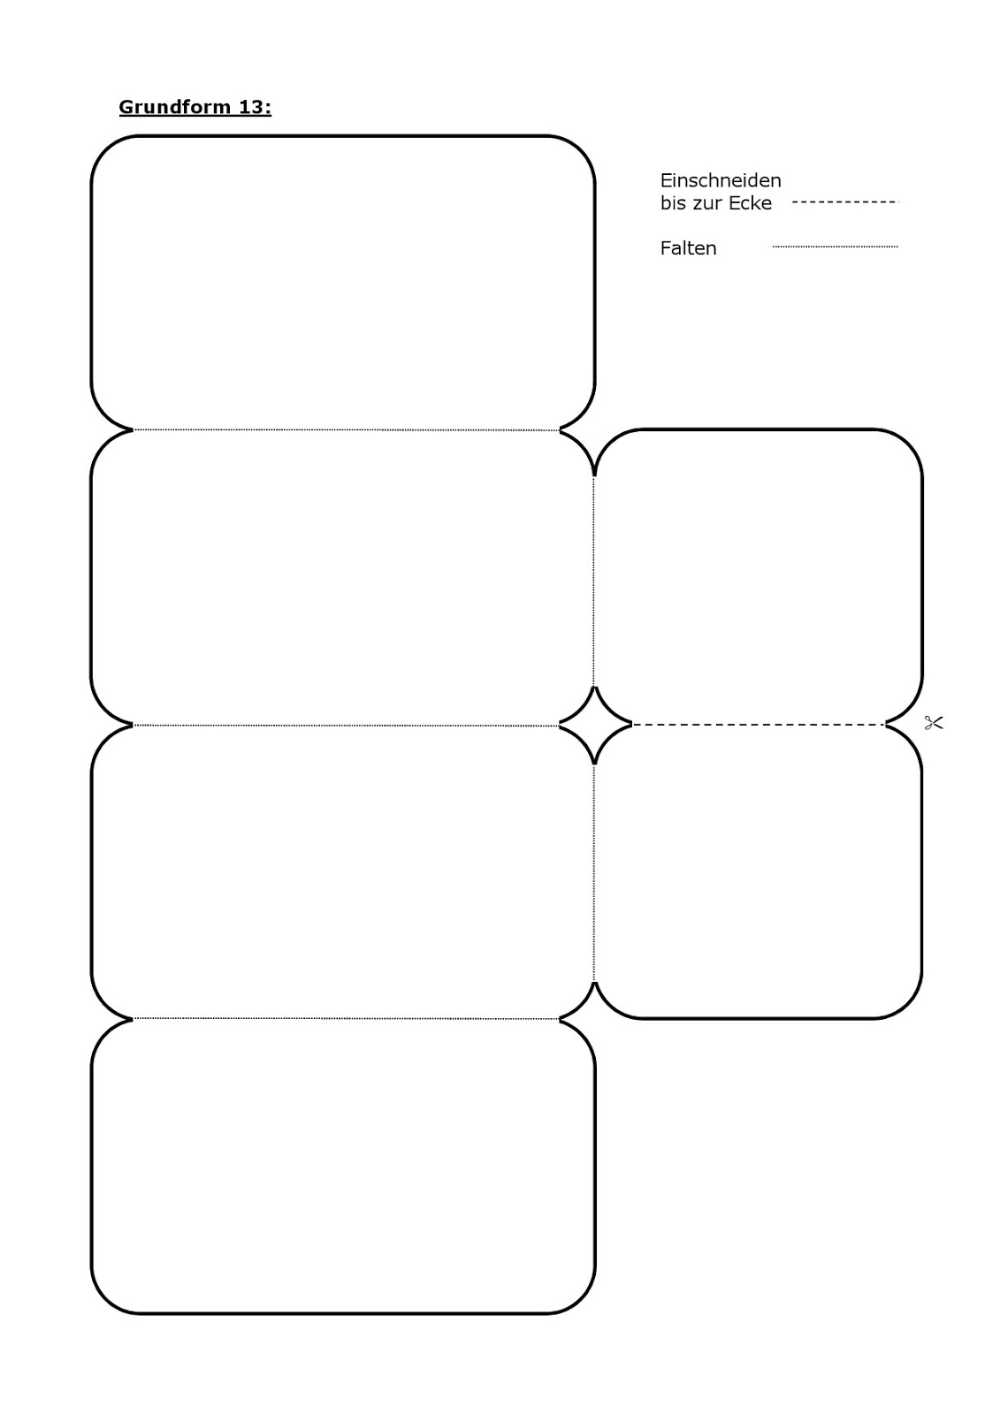 Lapbook Creativos Lapbook Ideas Lapbook Printable Lap Books Lapbook Plantillas Lapbook Templates Lapbook Vo Flip Book Template Lap Book Templates Lapbook